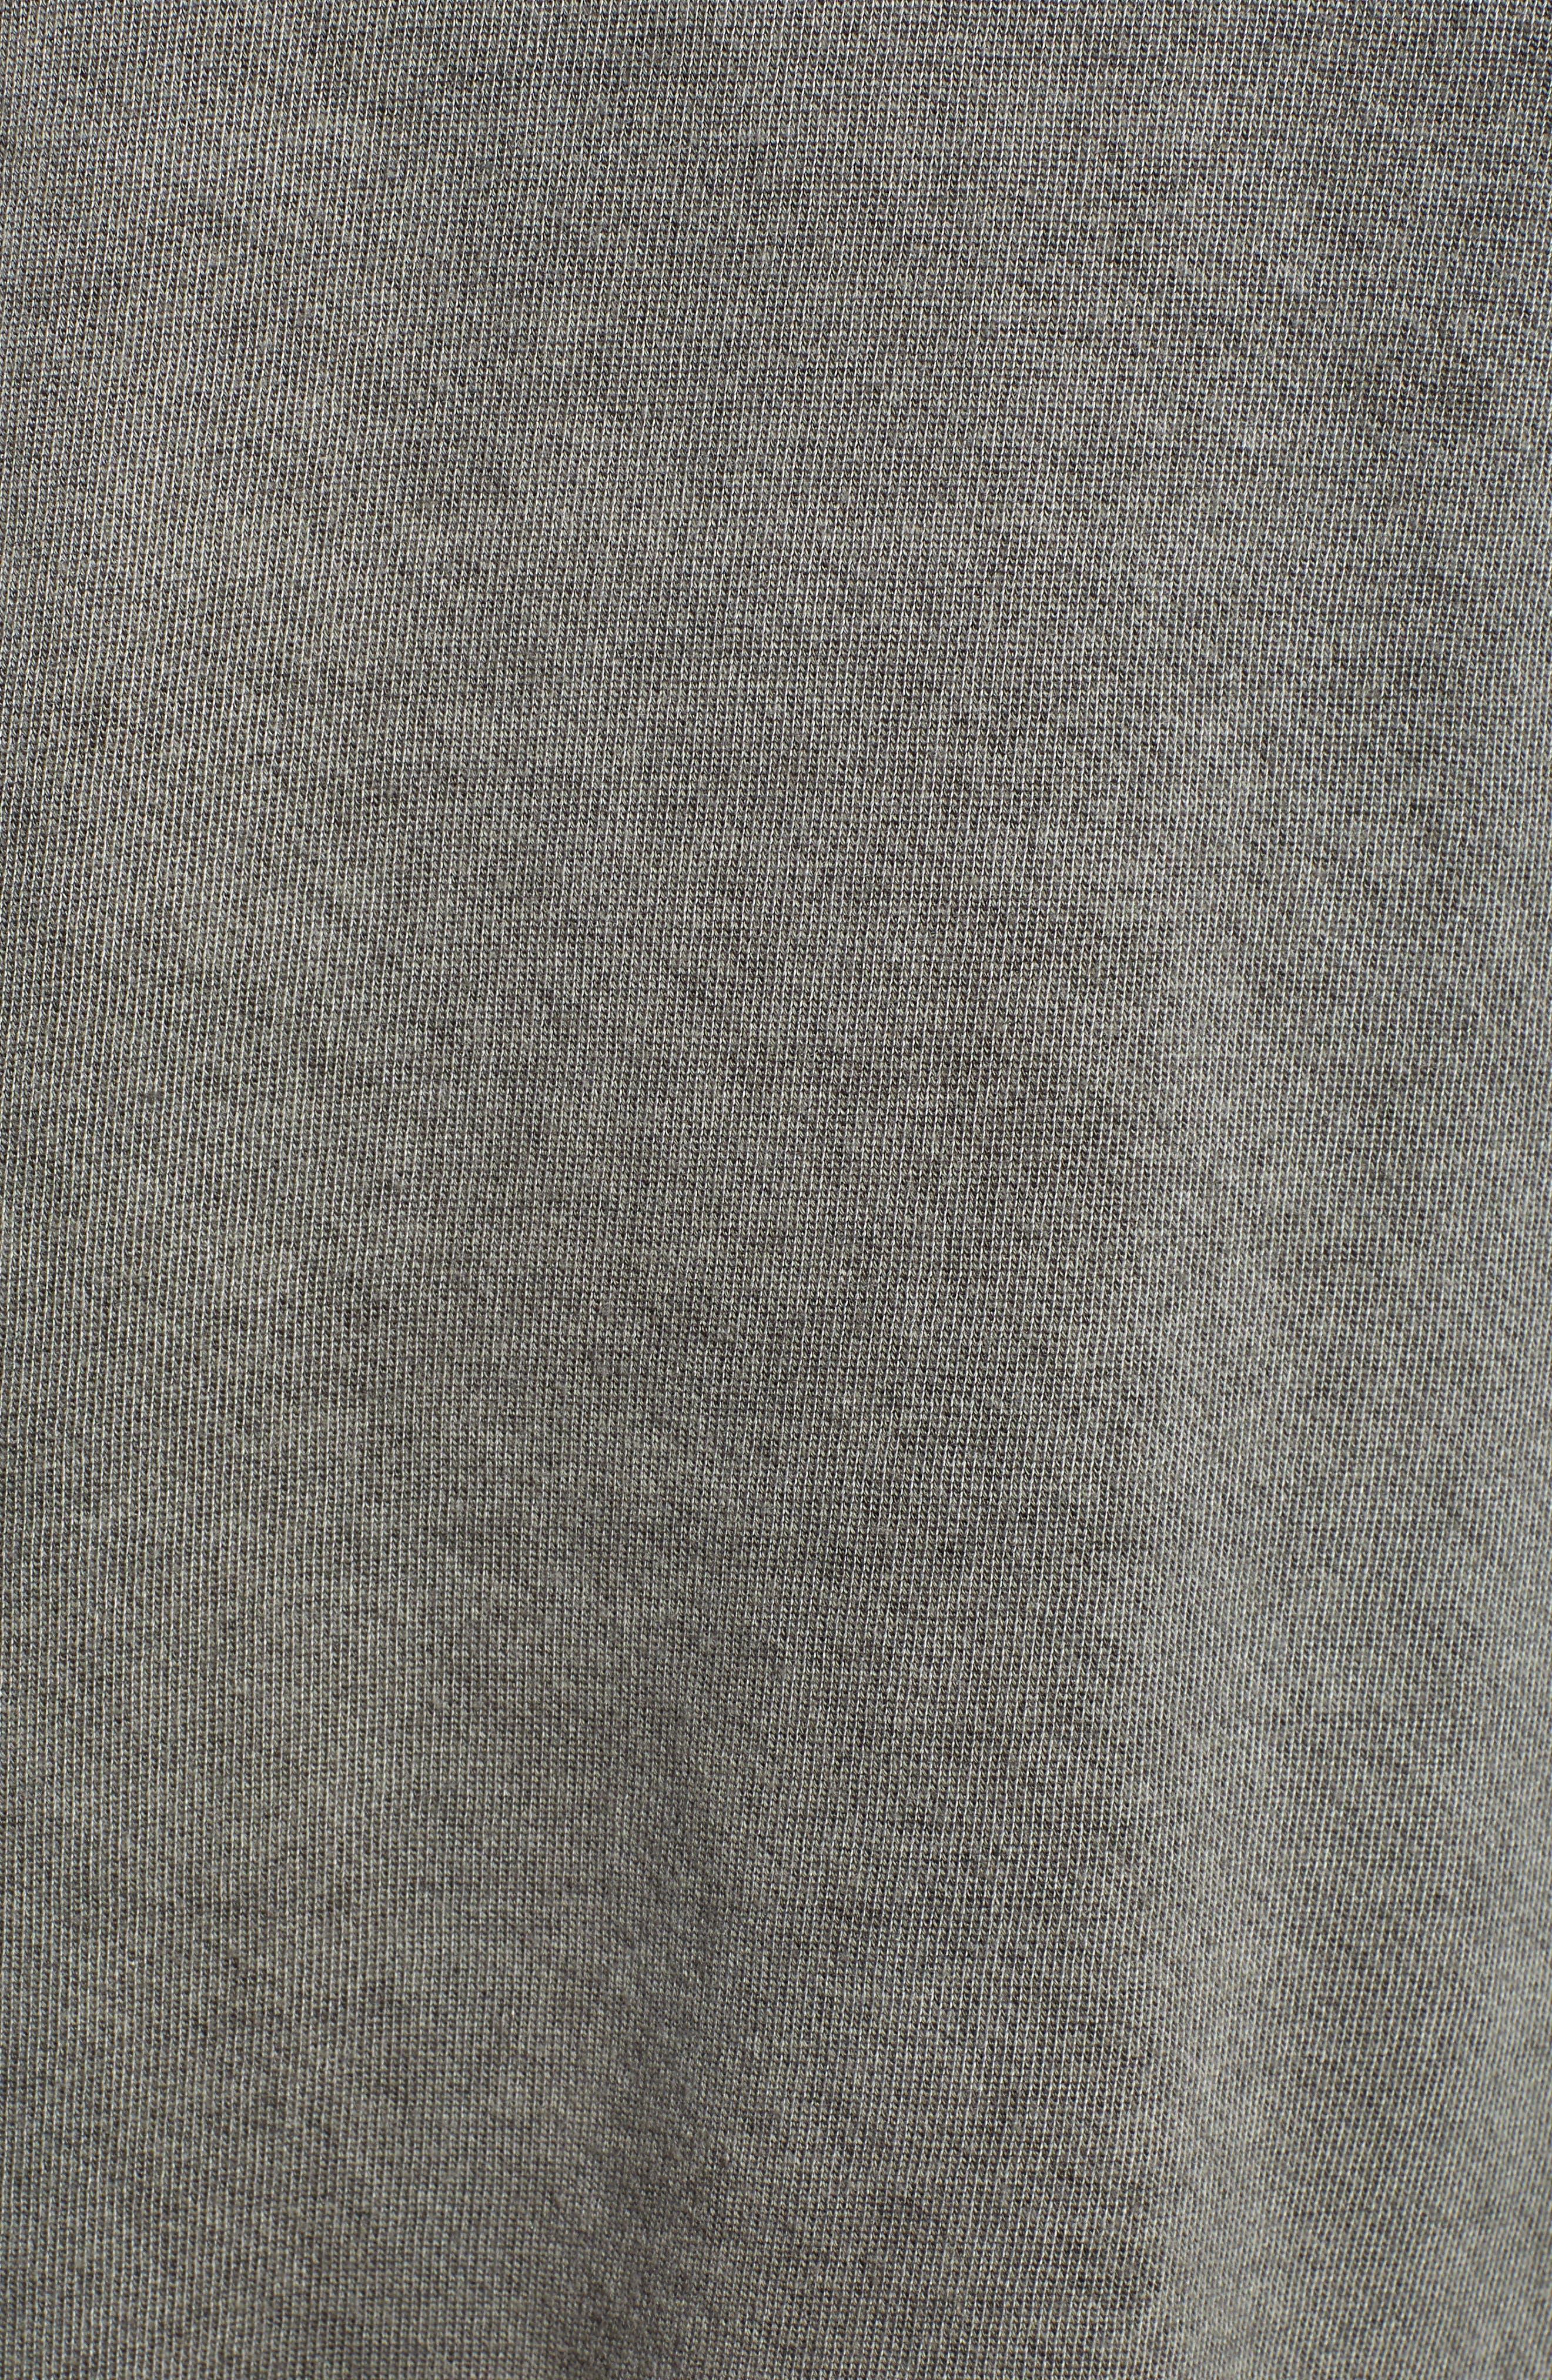 Honey Faded Sweatshirt,                             Alternate thumbnail 5, color,                             300